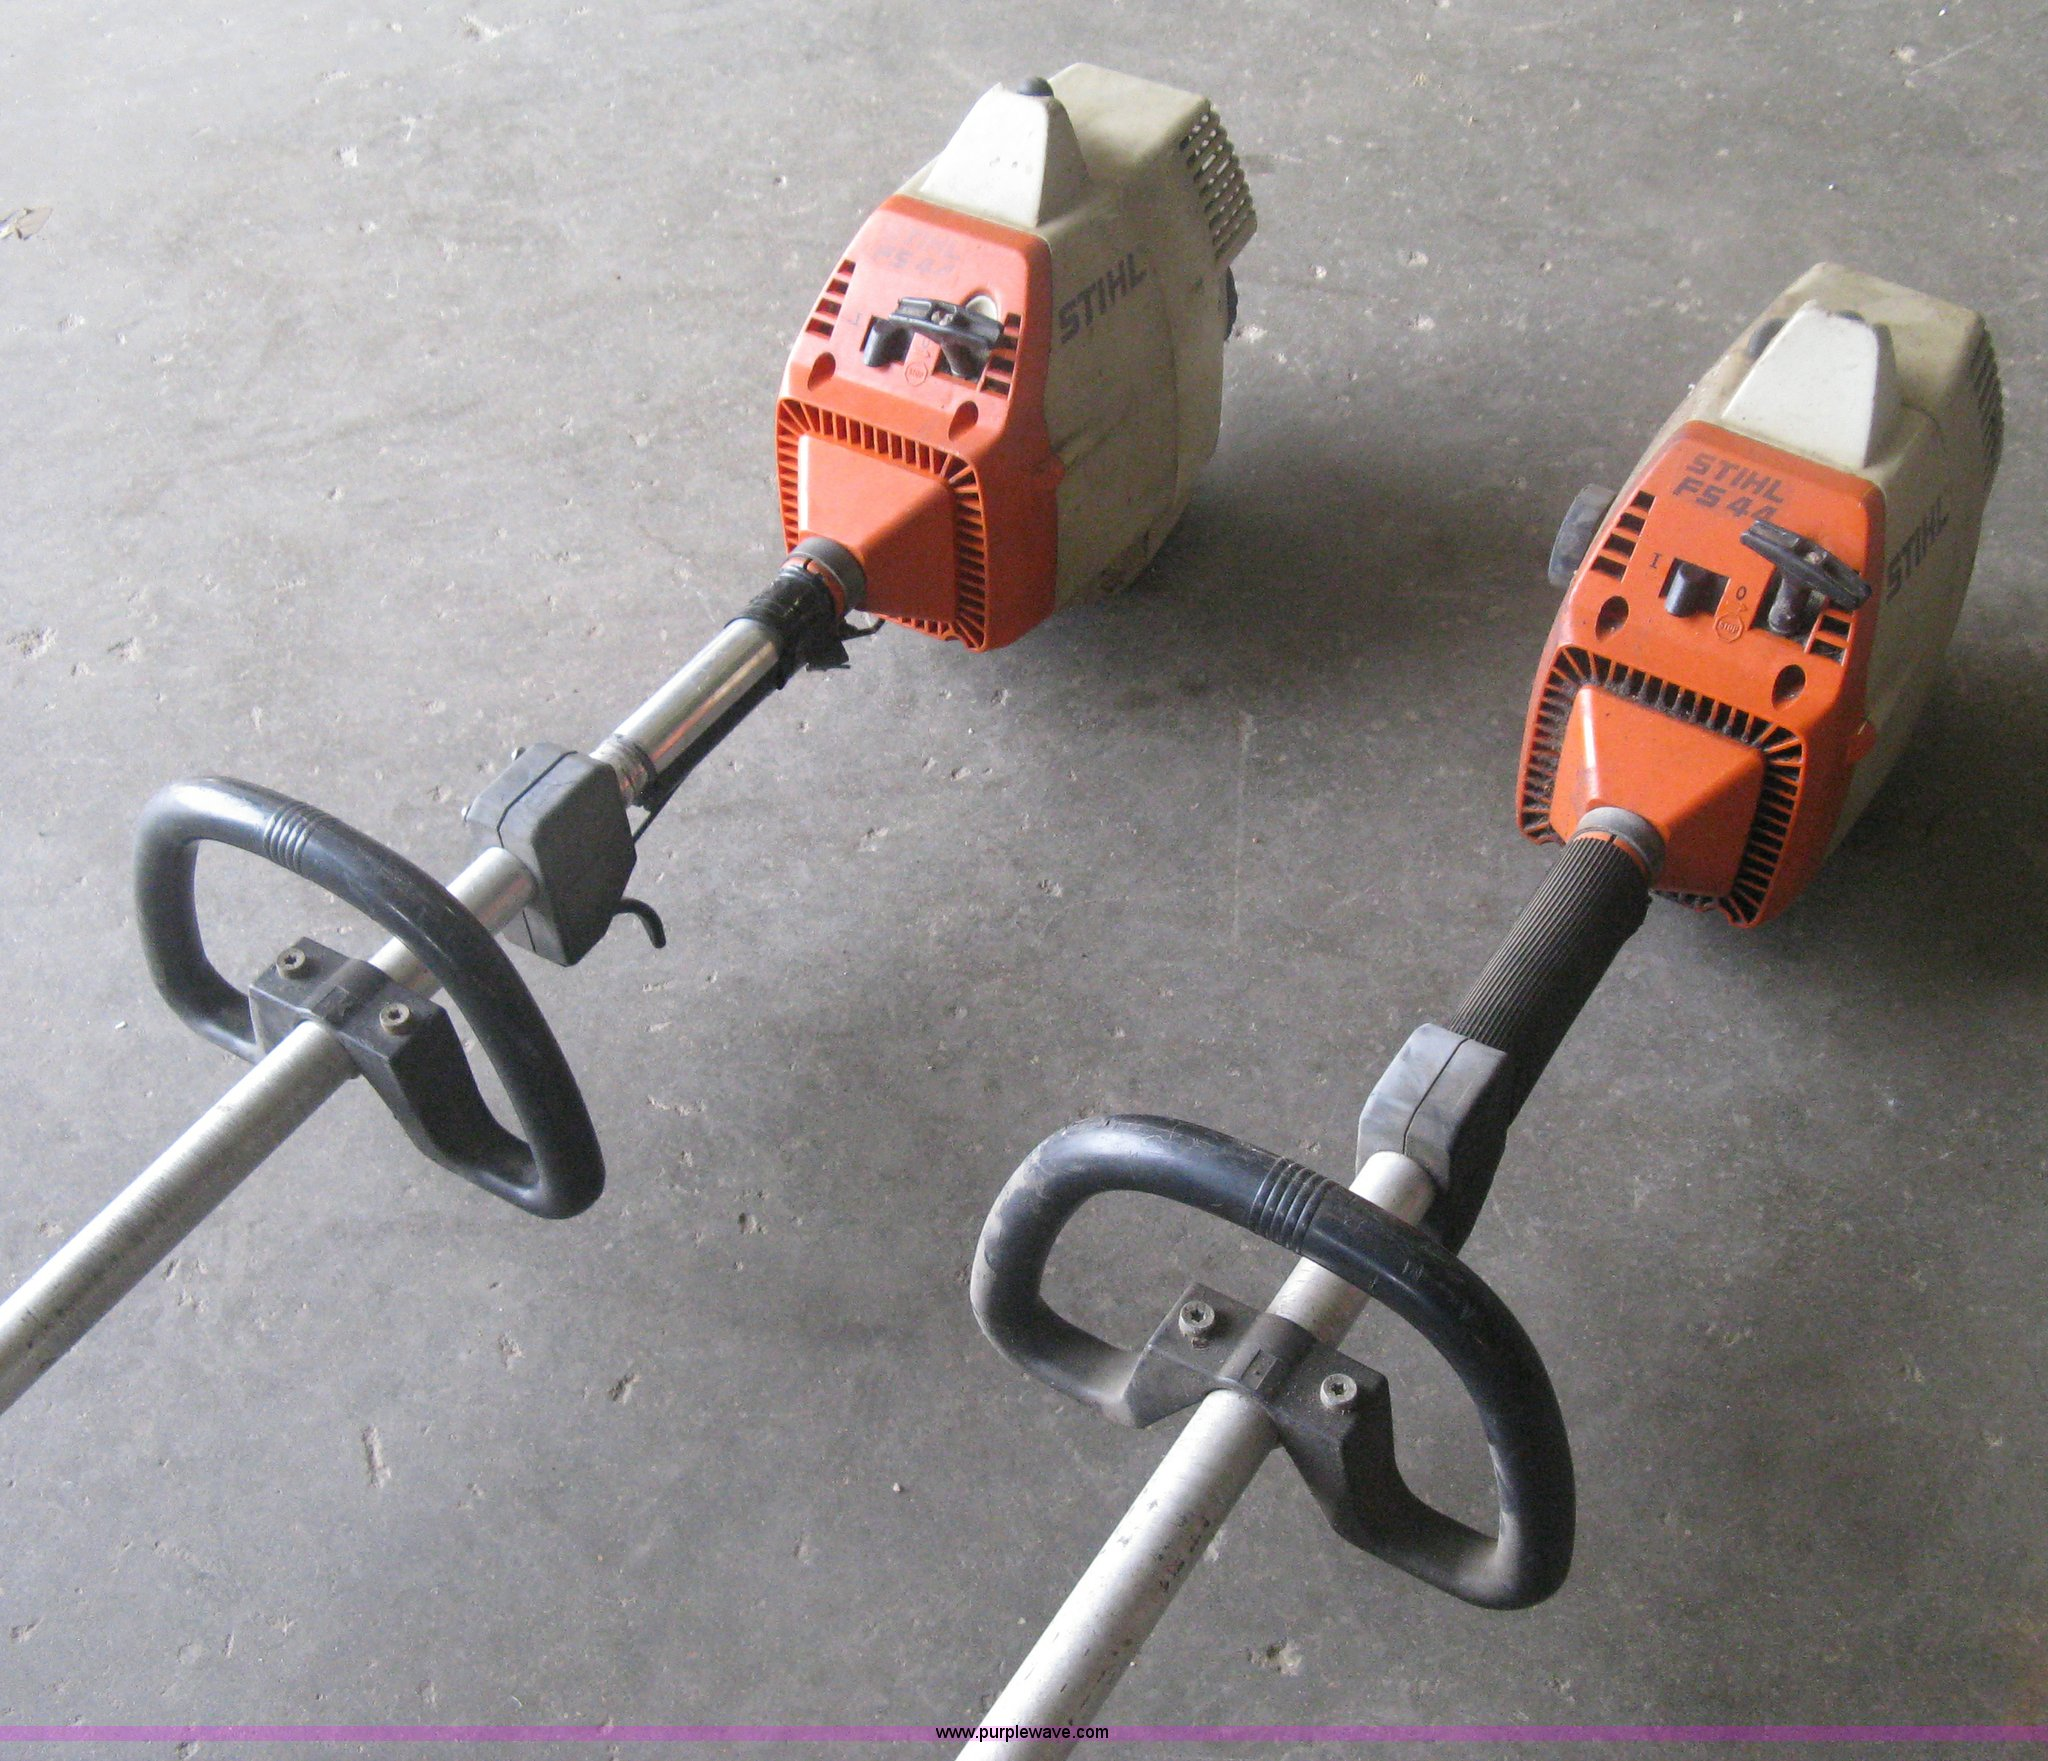 2) Stihl FS44 string trimmers | Item AV9114 selling at SOLD